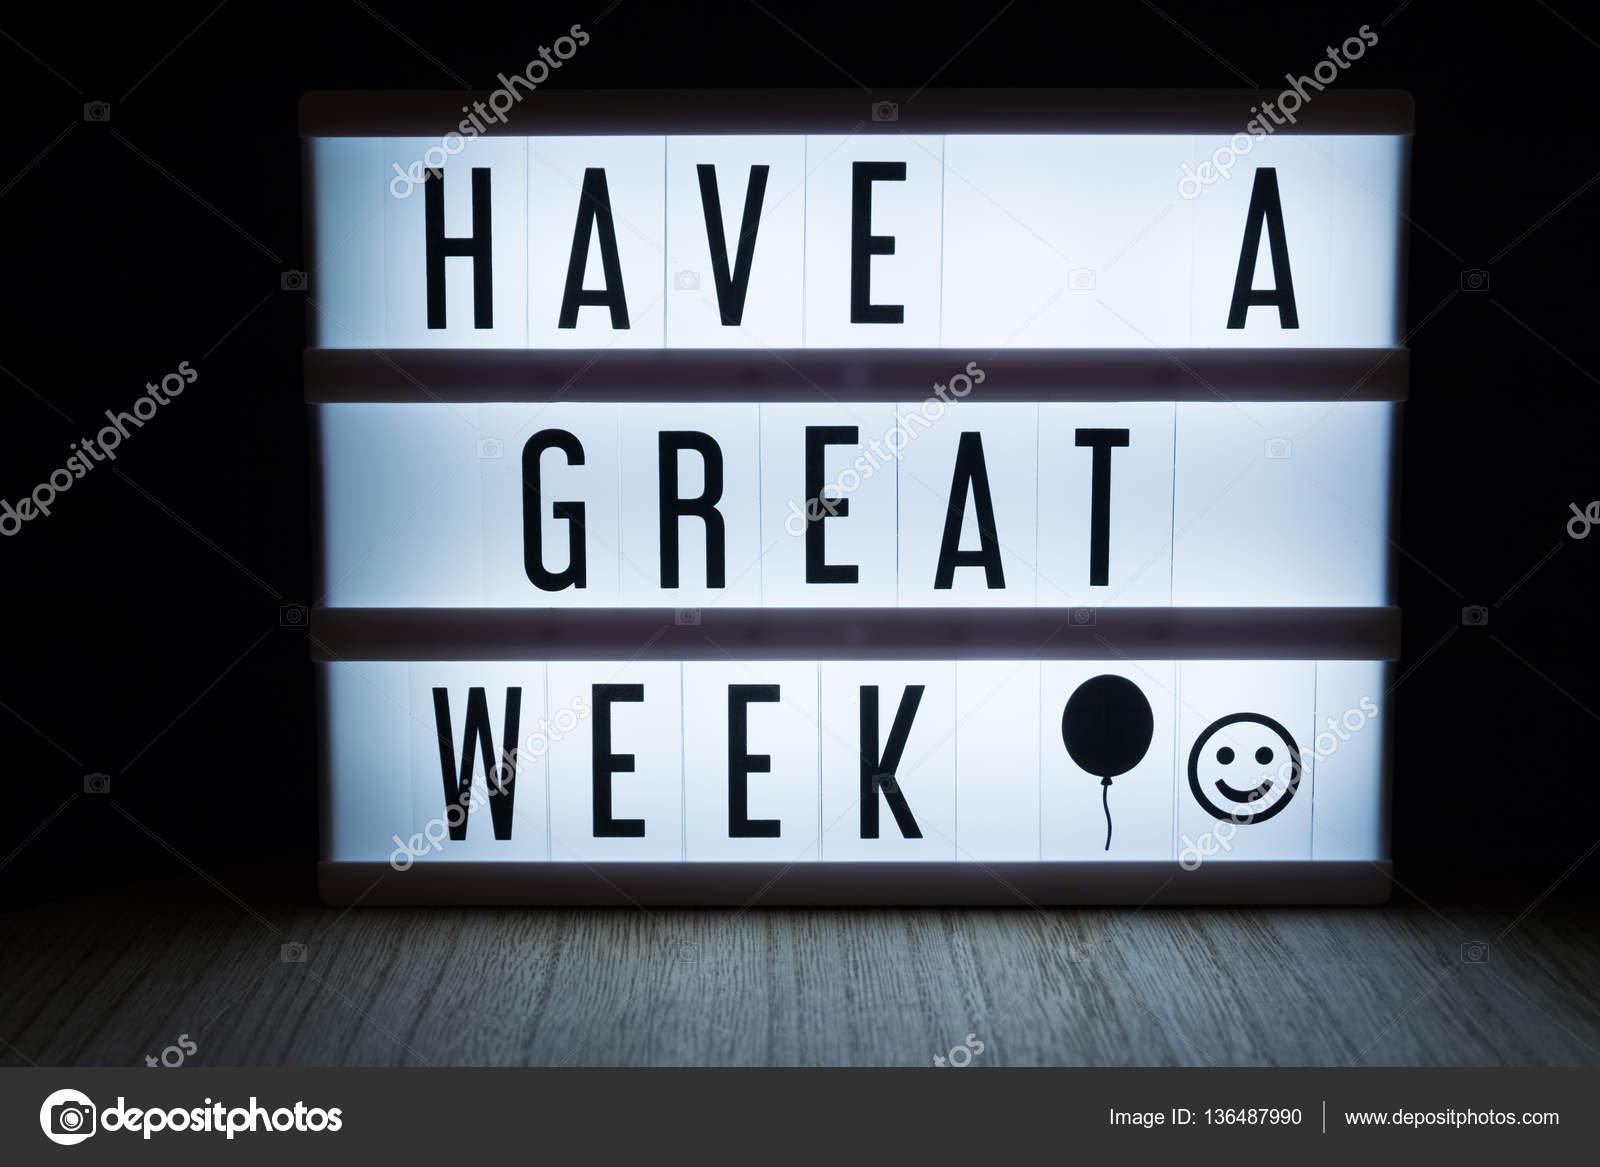 Have A Great Weekend Tekst In Lightbox Stockfoto Wvdz 136487990